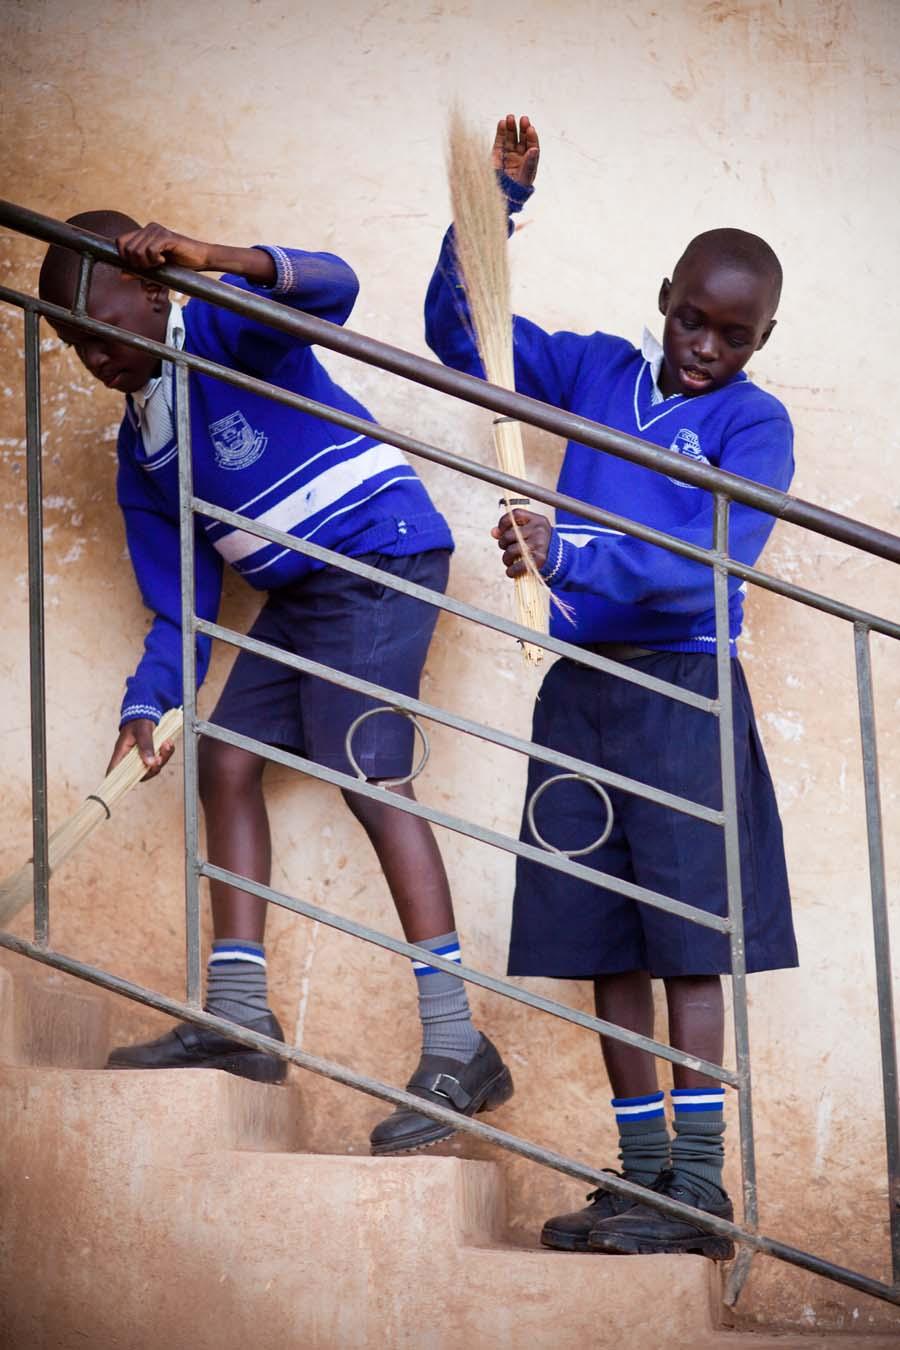 jessicadavisphotography.com | Jessica Davis Photography | Portrait Work in Uganda| Travel Photographer | World Event Photographs 9 (7).jpg